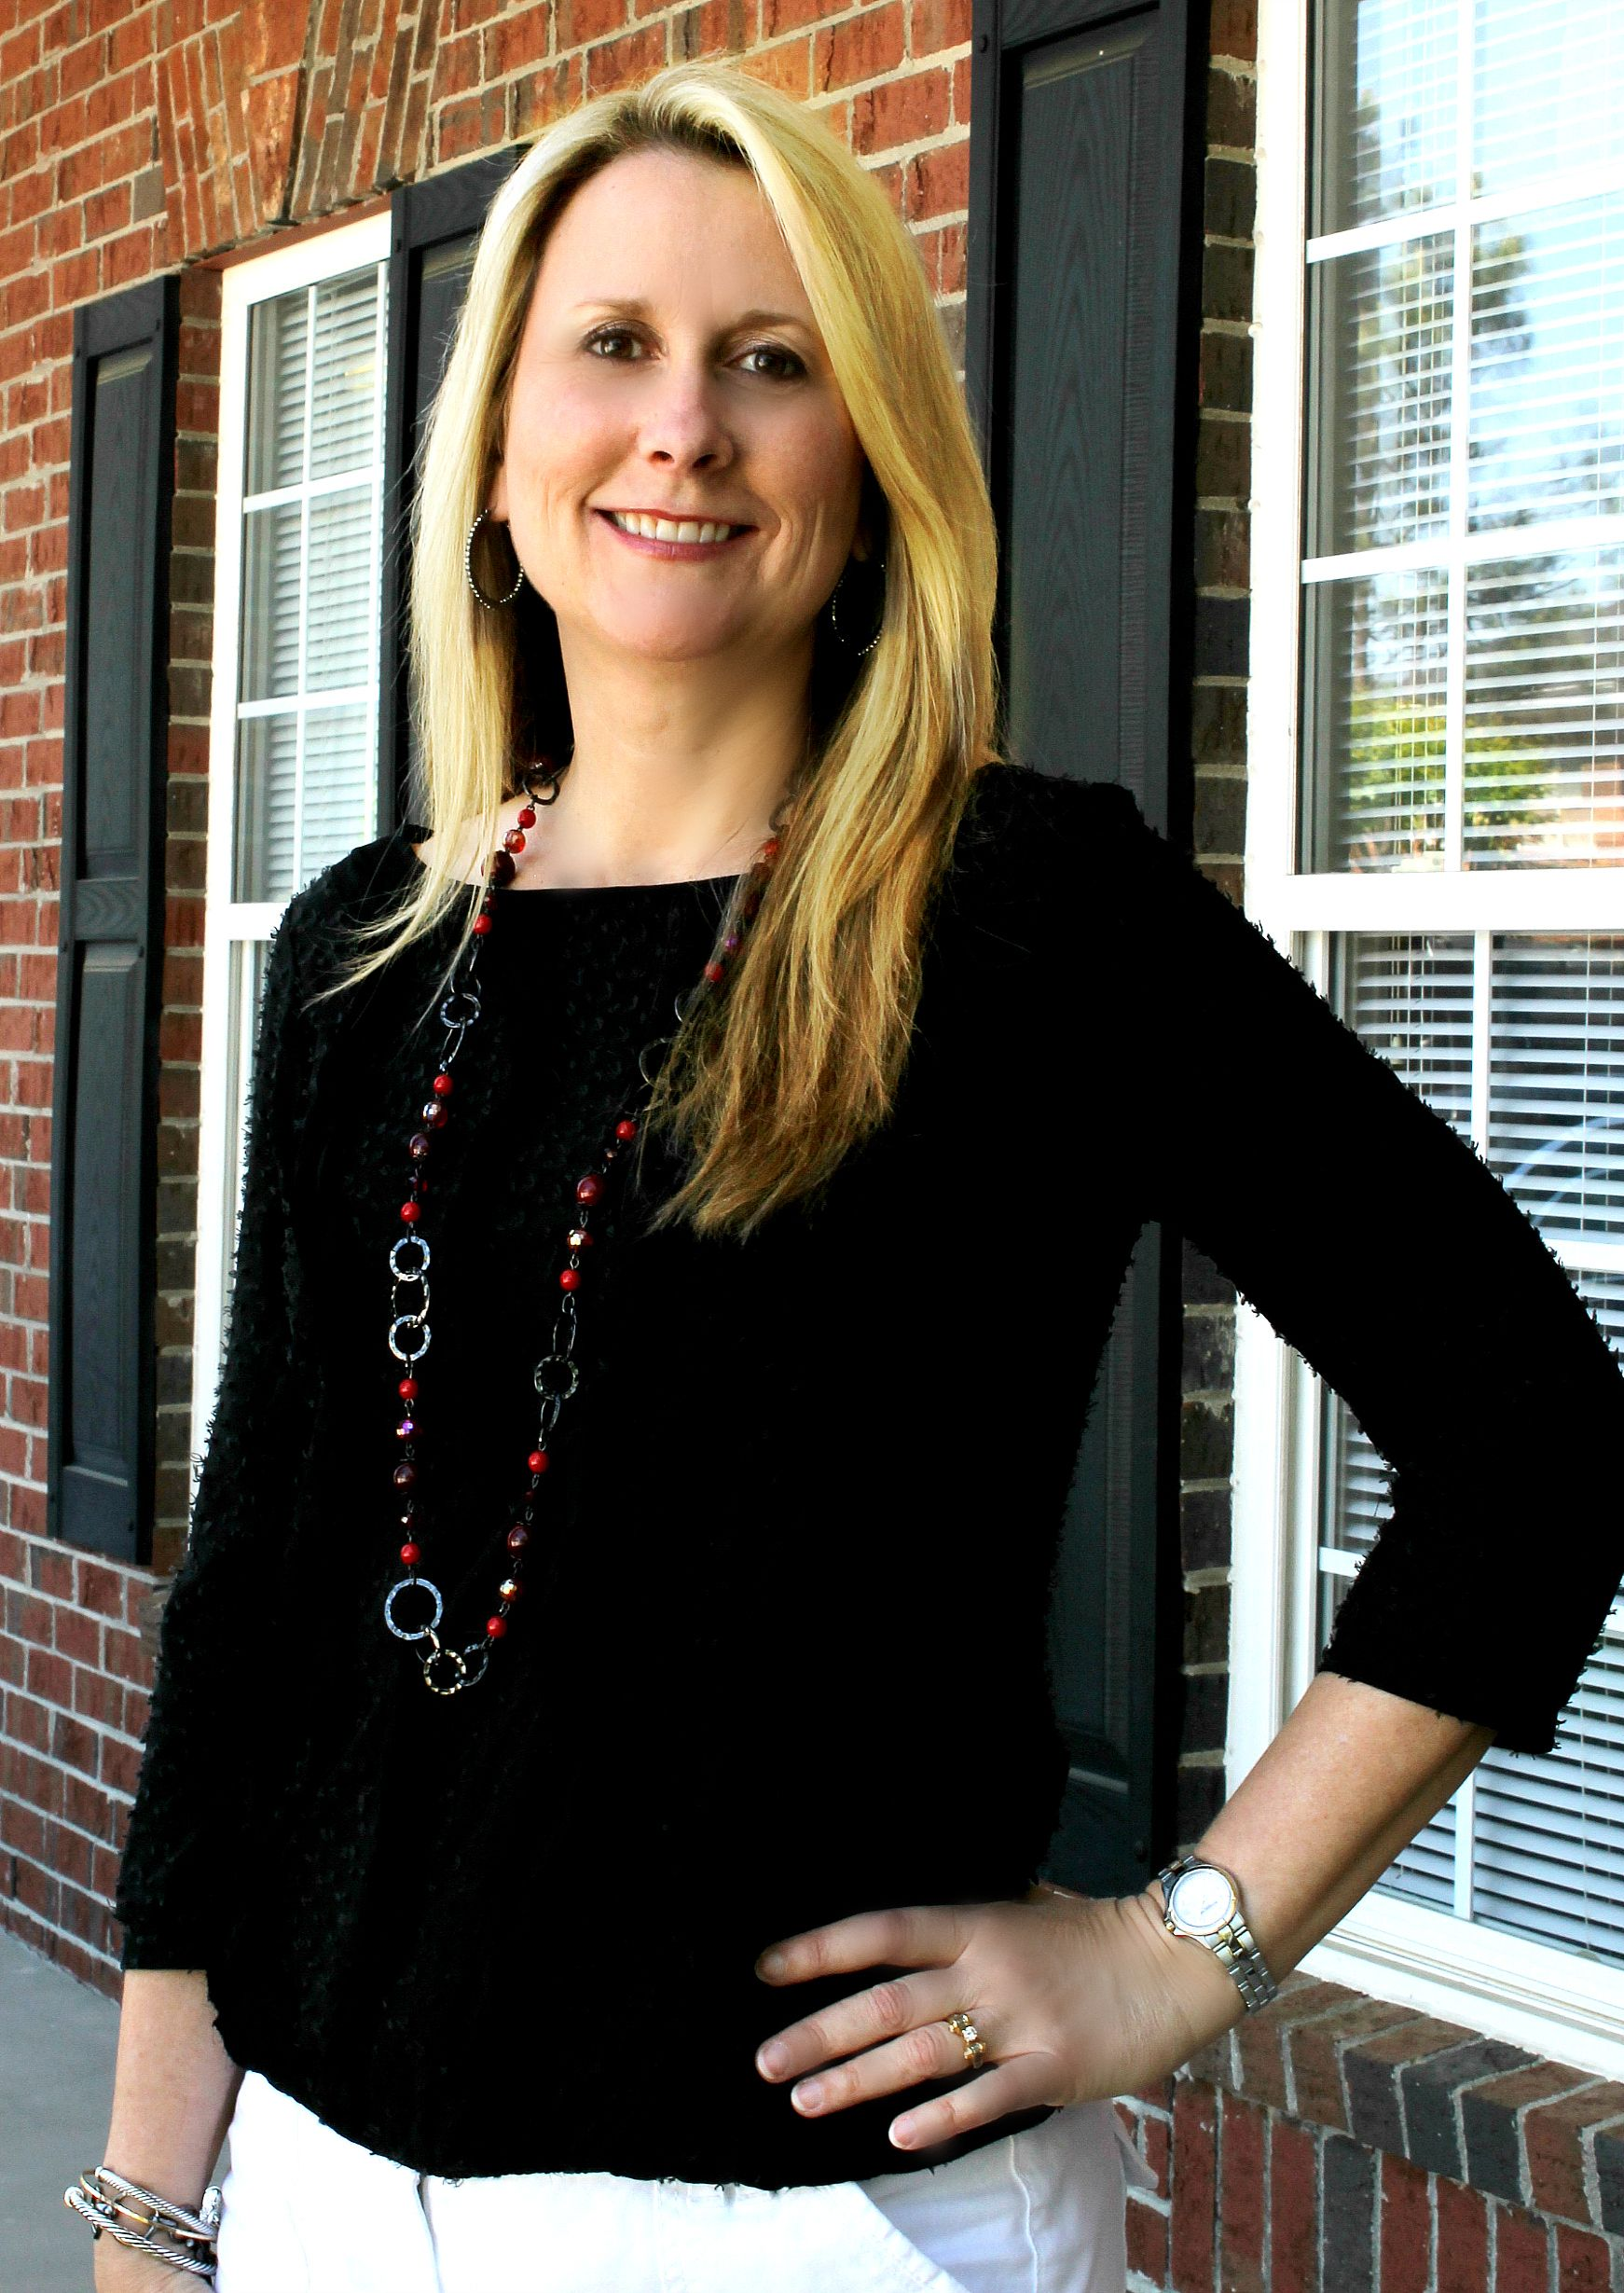 Kristen Knispel - Natalie Poteete Team #NataliePoteeteTeam #REMAX #RealEstate #BuyersAgent #Augusta #Georgia